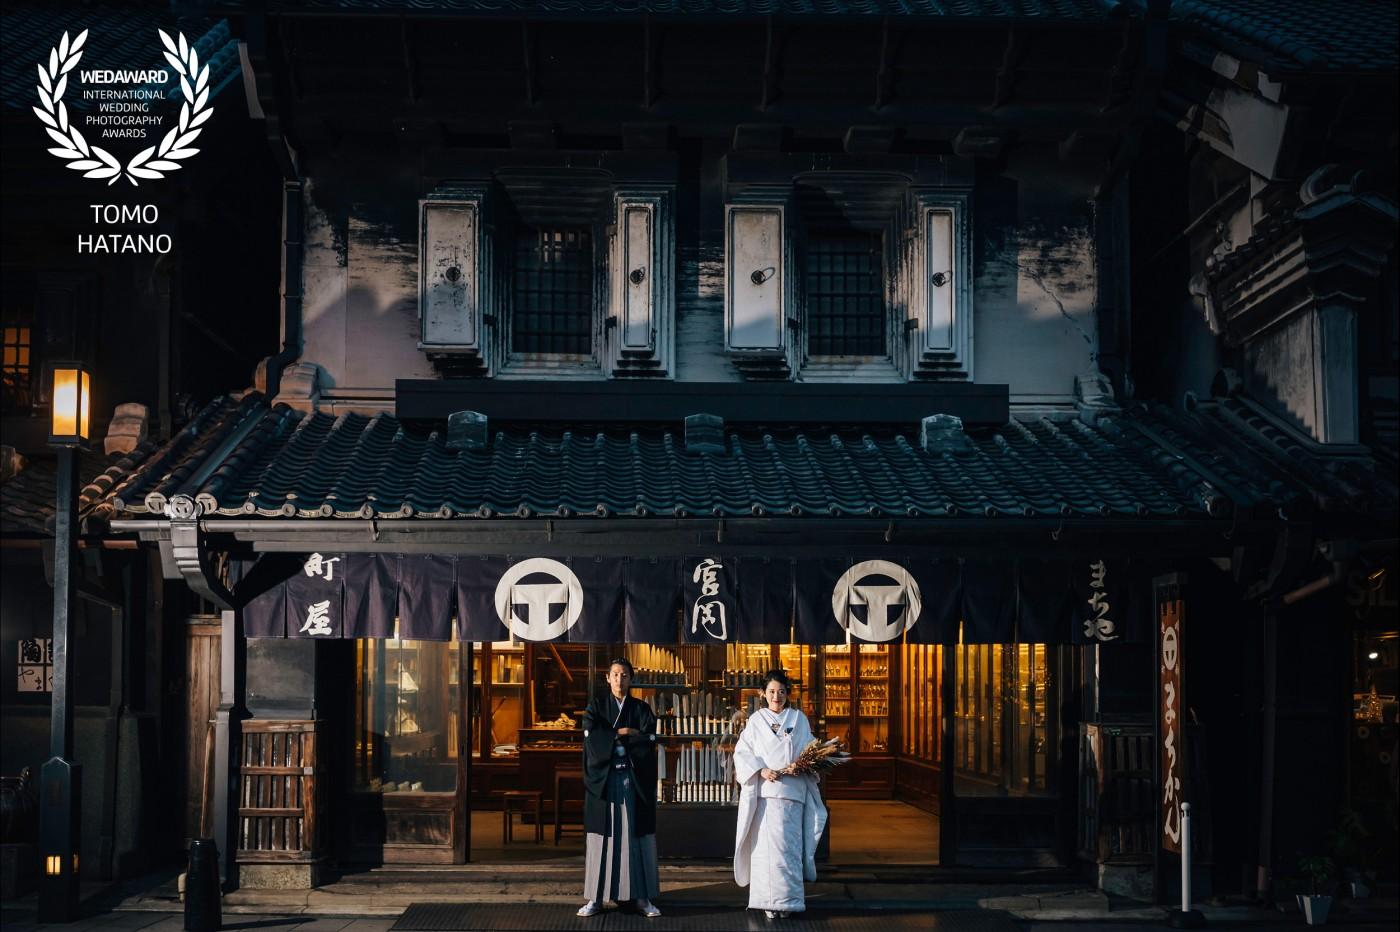 TOMO-HATANO-japan-40collection-wedaward-com_1545715746.jpg